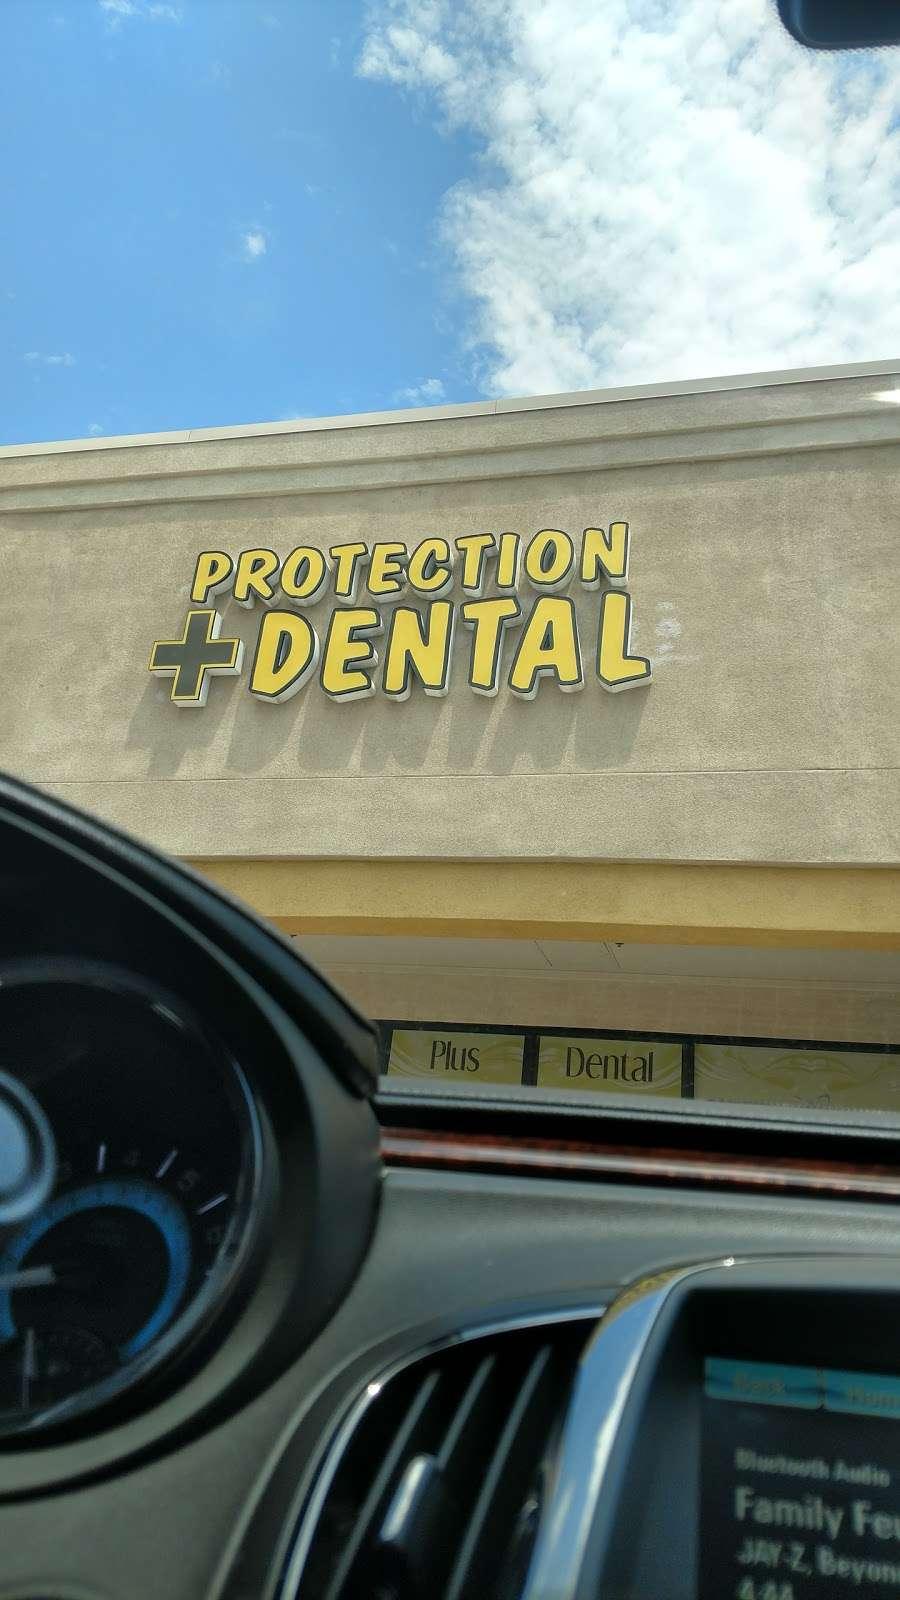 Protection Plus Dental Glendale - dentist  | Photo 8 of 10 | Address: 7025 N 75th Ave #101, Glendale, AZ 85303, USA | Phone: (623) 322-1399